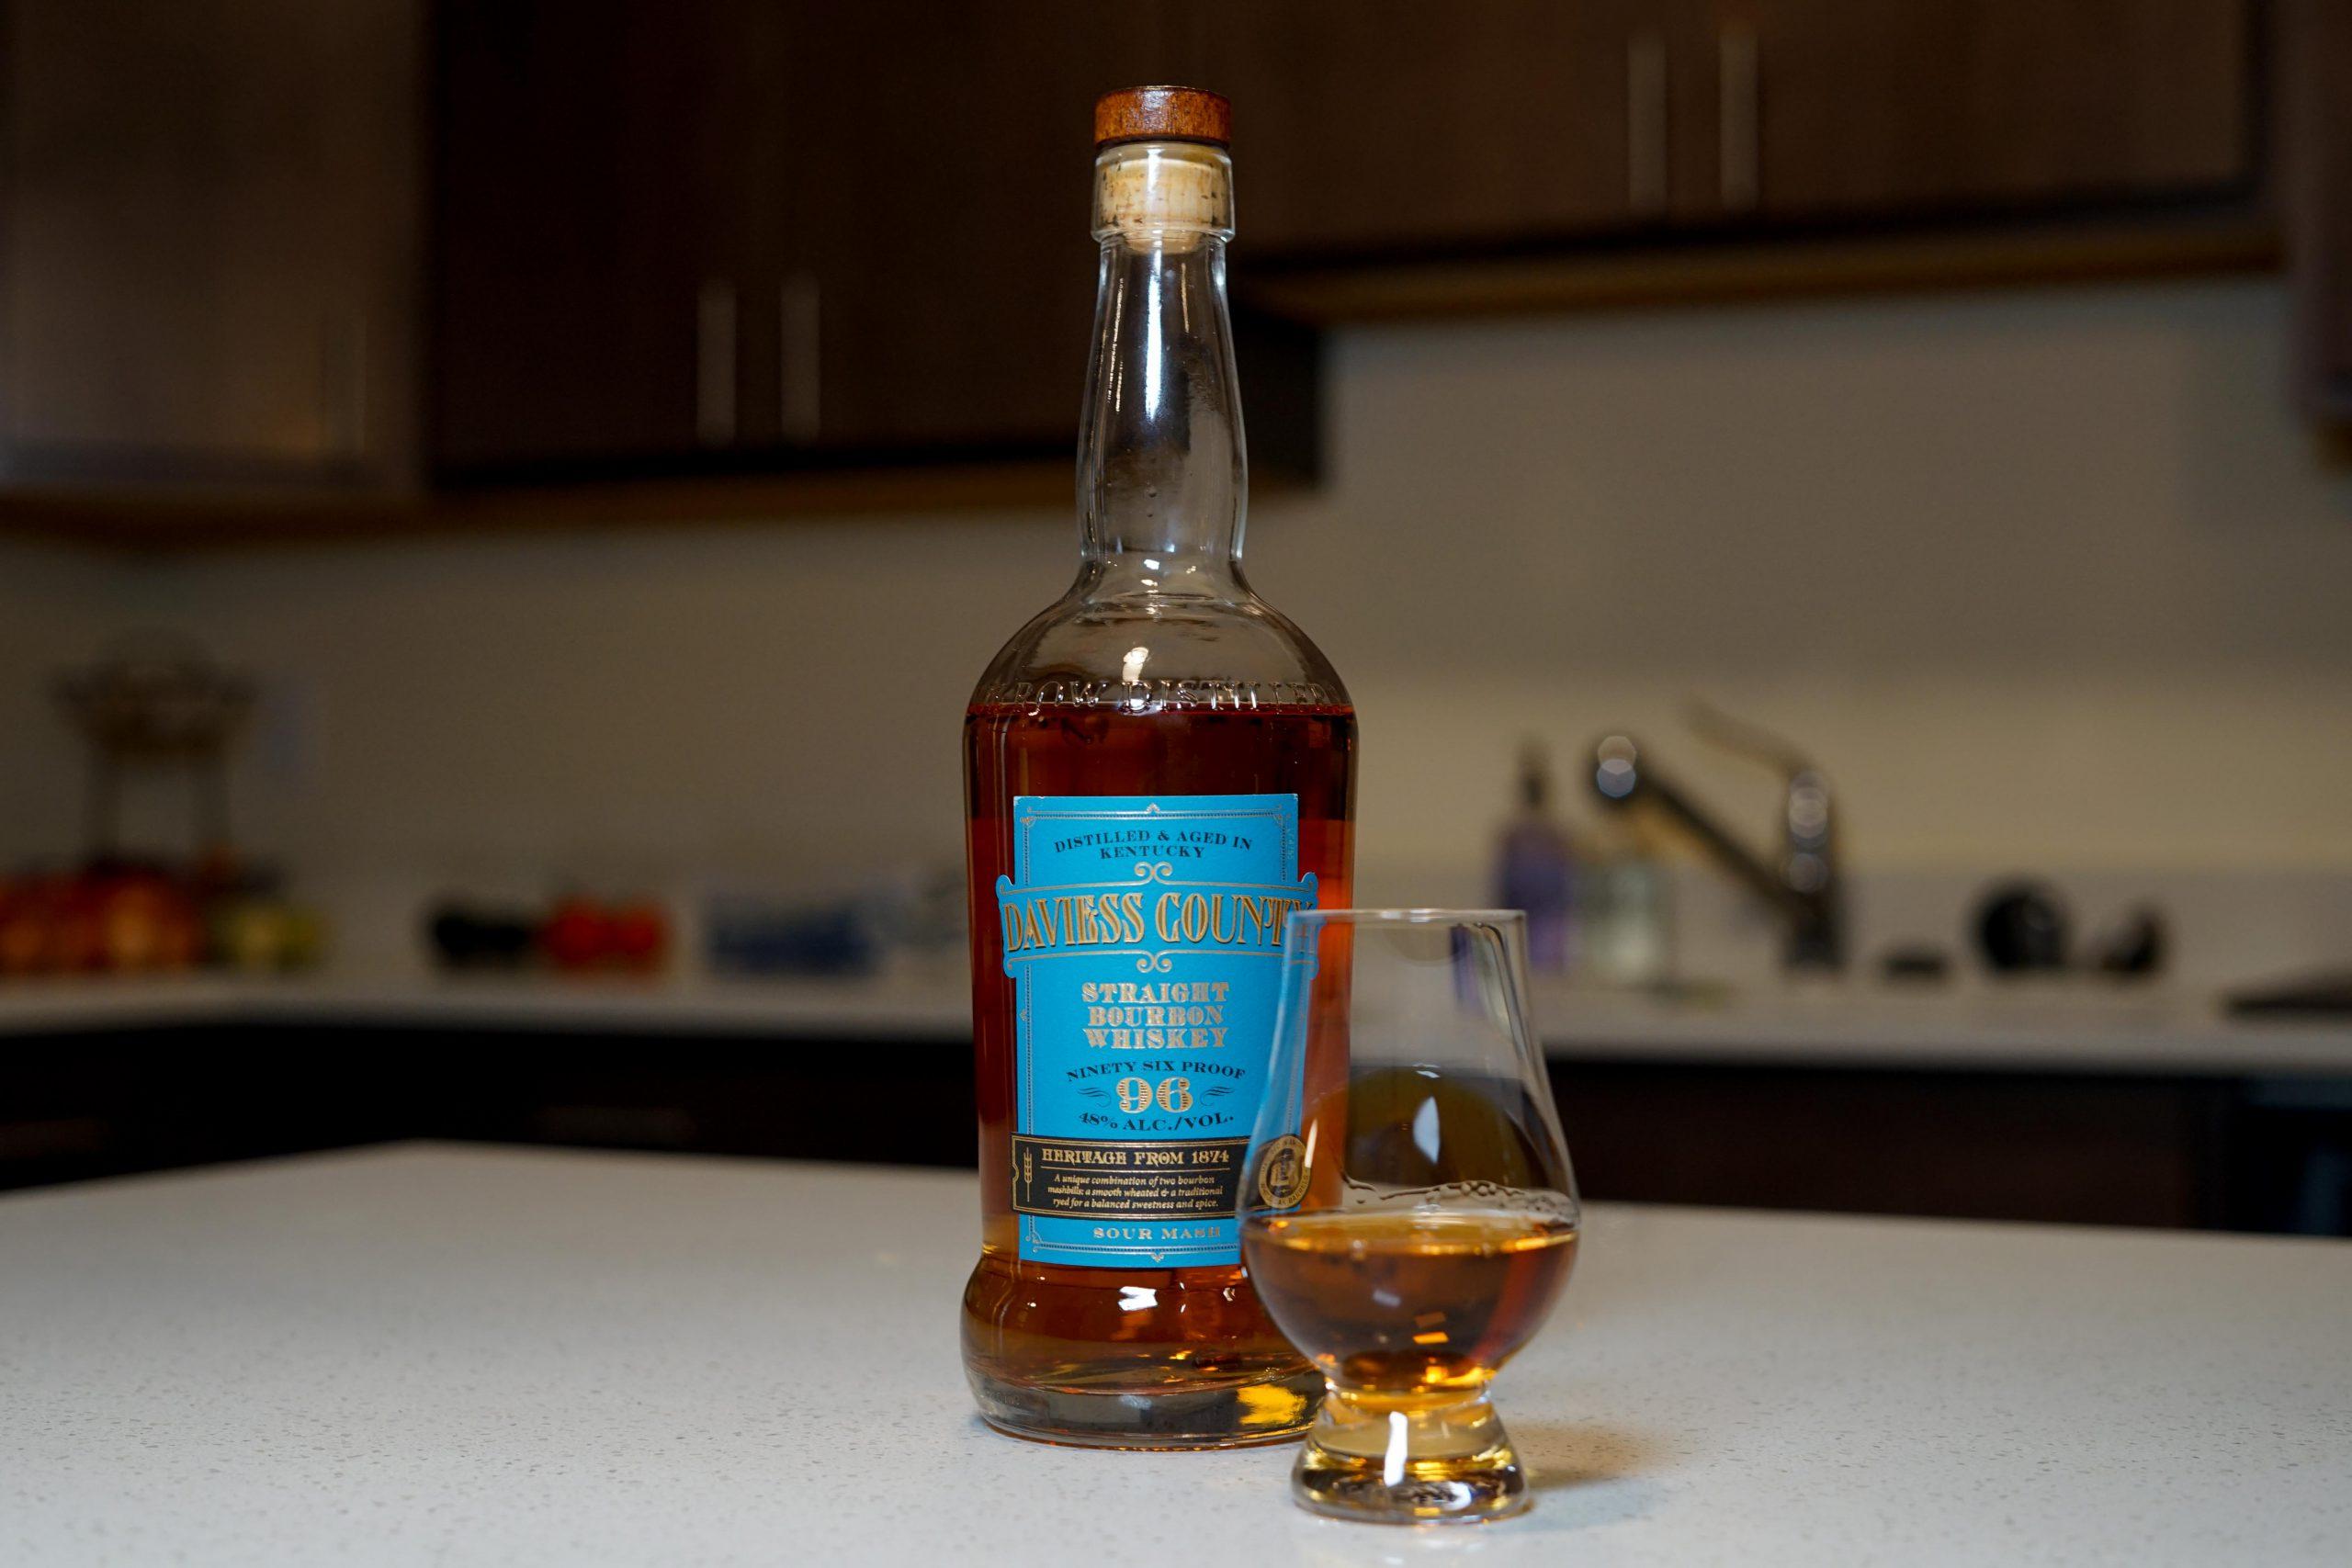 Daviess County Straight Bourbon